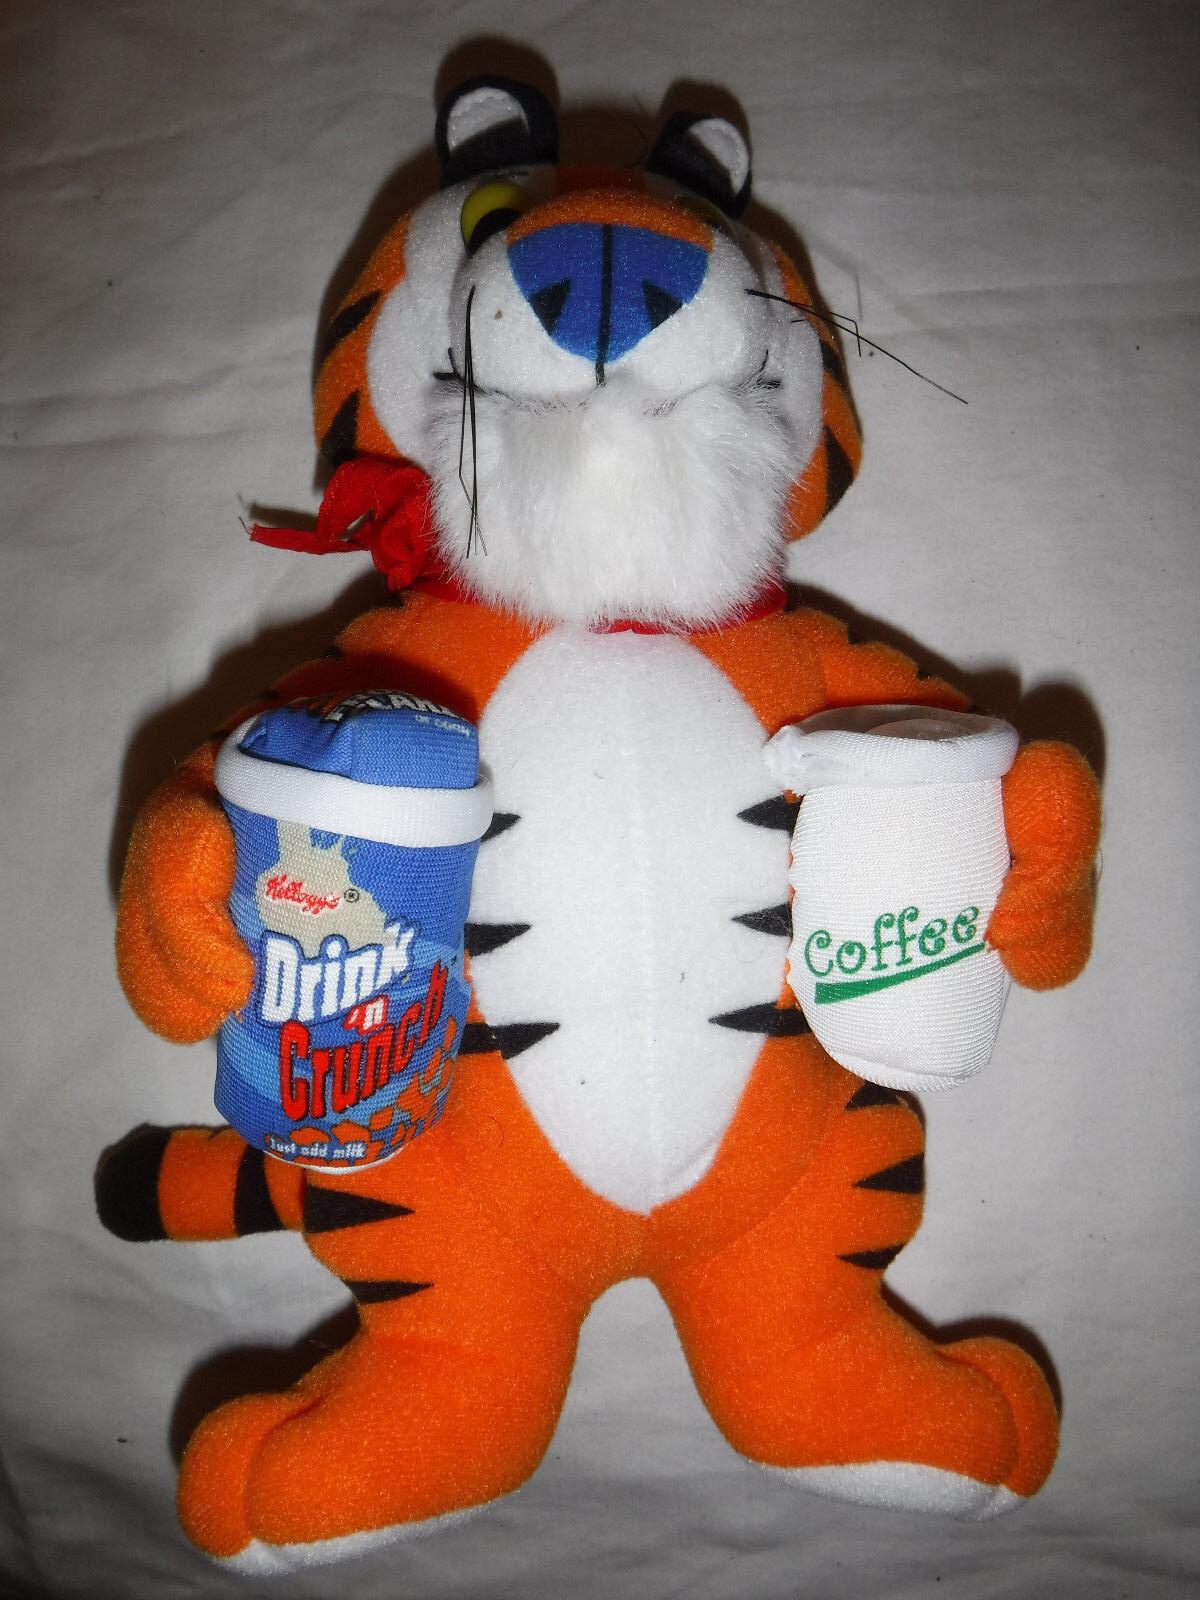 2005 Kellogg Tony the Tiger Drink & 10 Plush Soft Toy Stuffed Animal